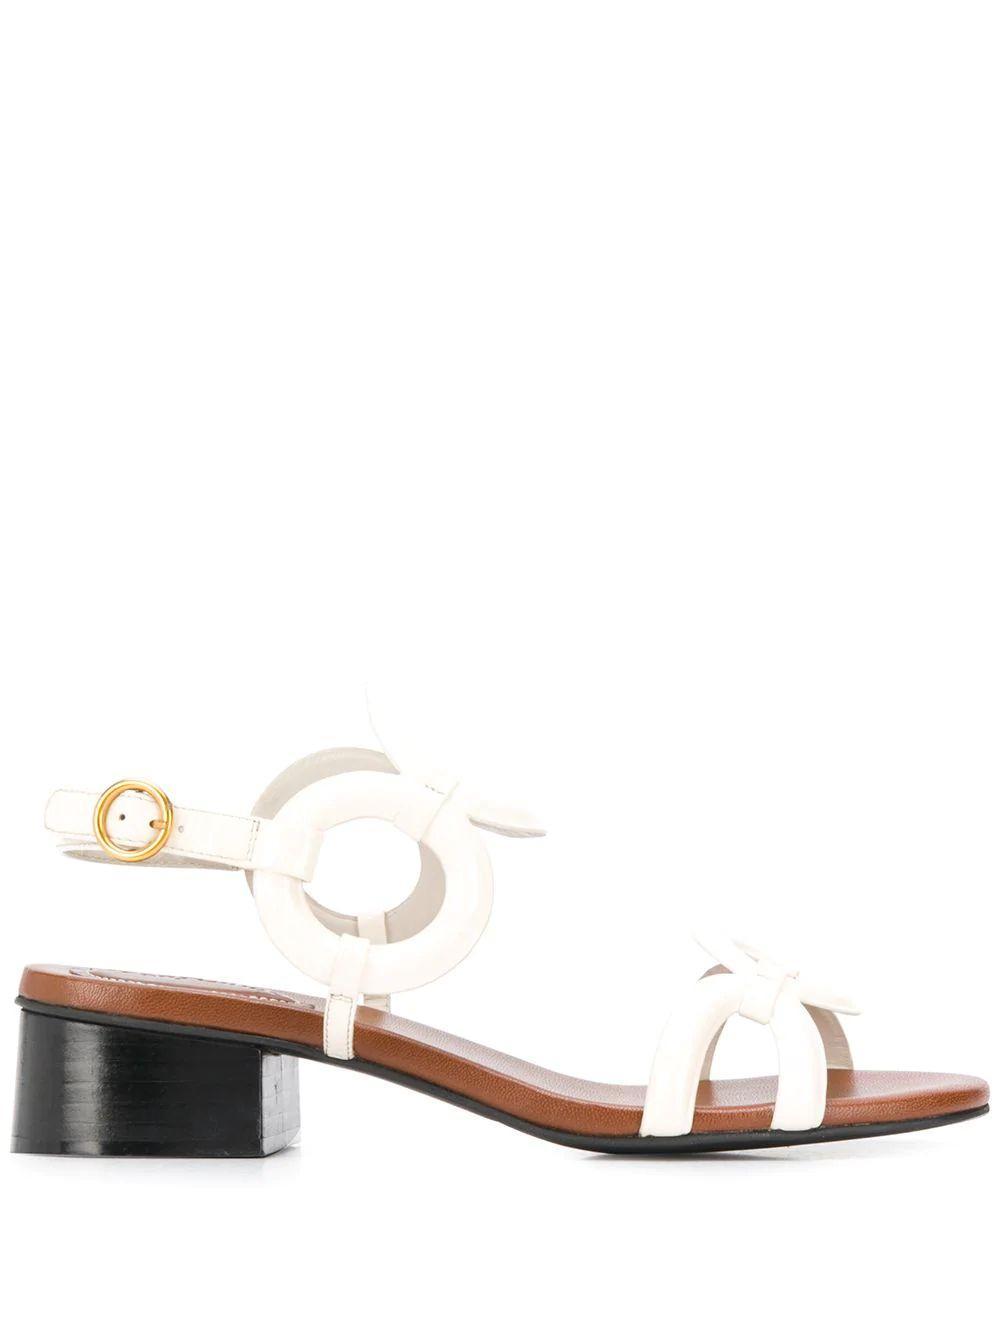 Rings Strap Block Heel Sandal